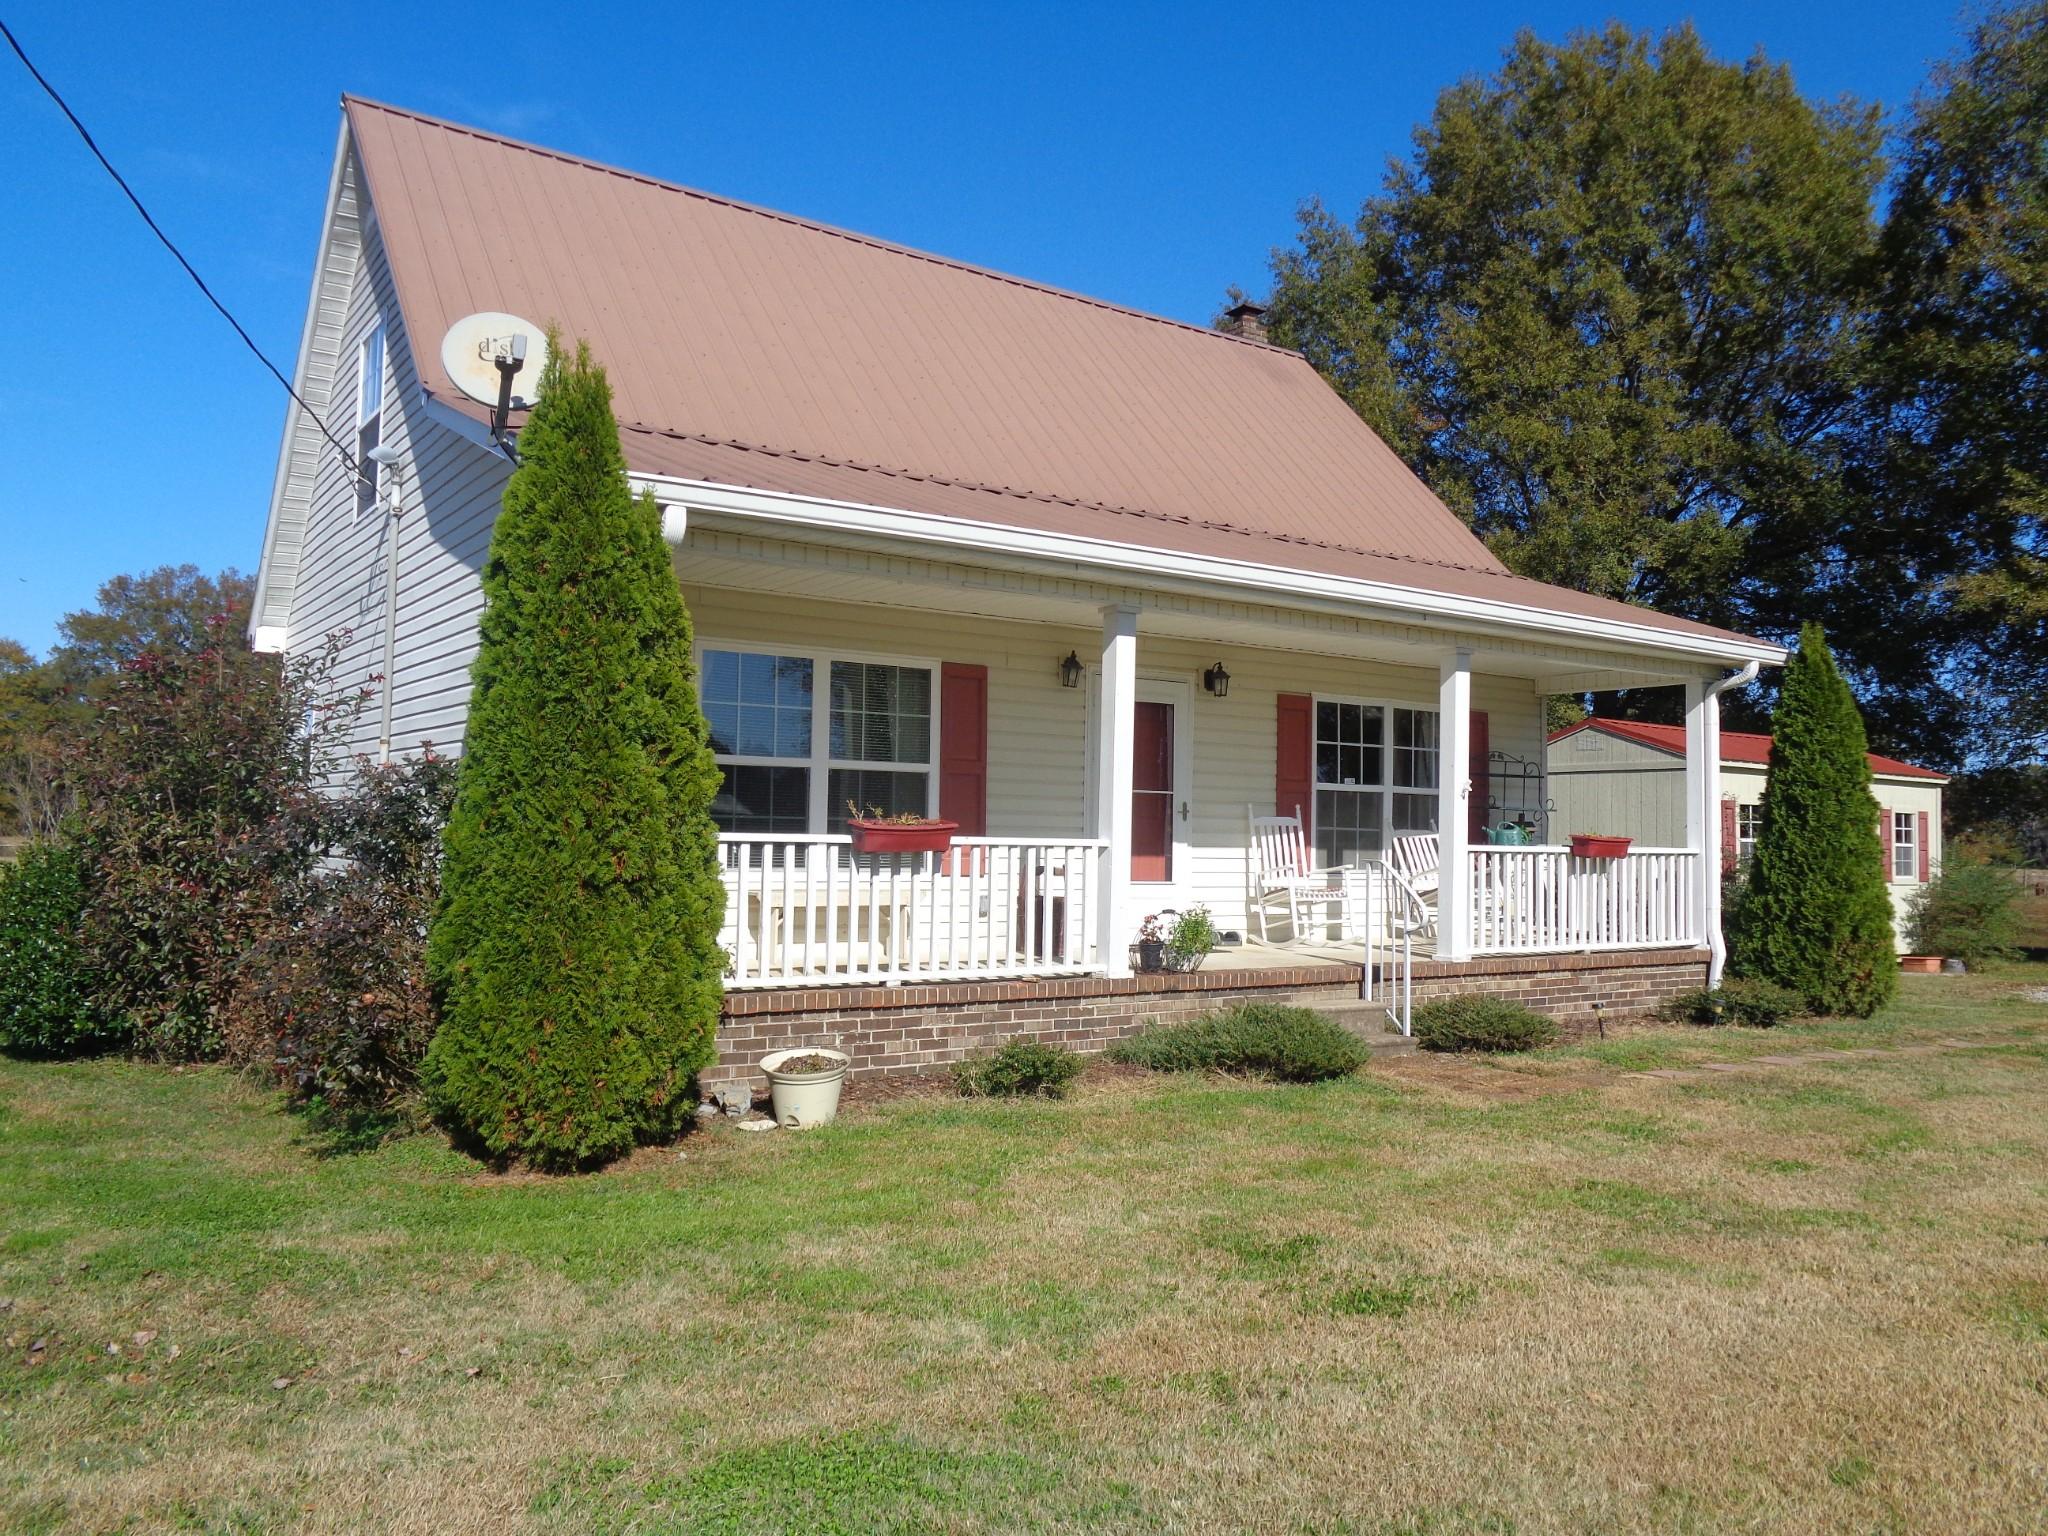 68 E Edan Rd, Ethridge, TN 38456 - Ethridge, TN real estate listing